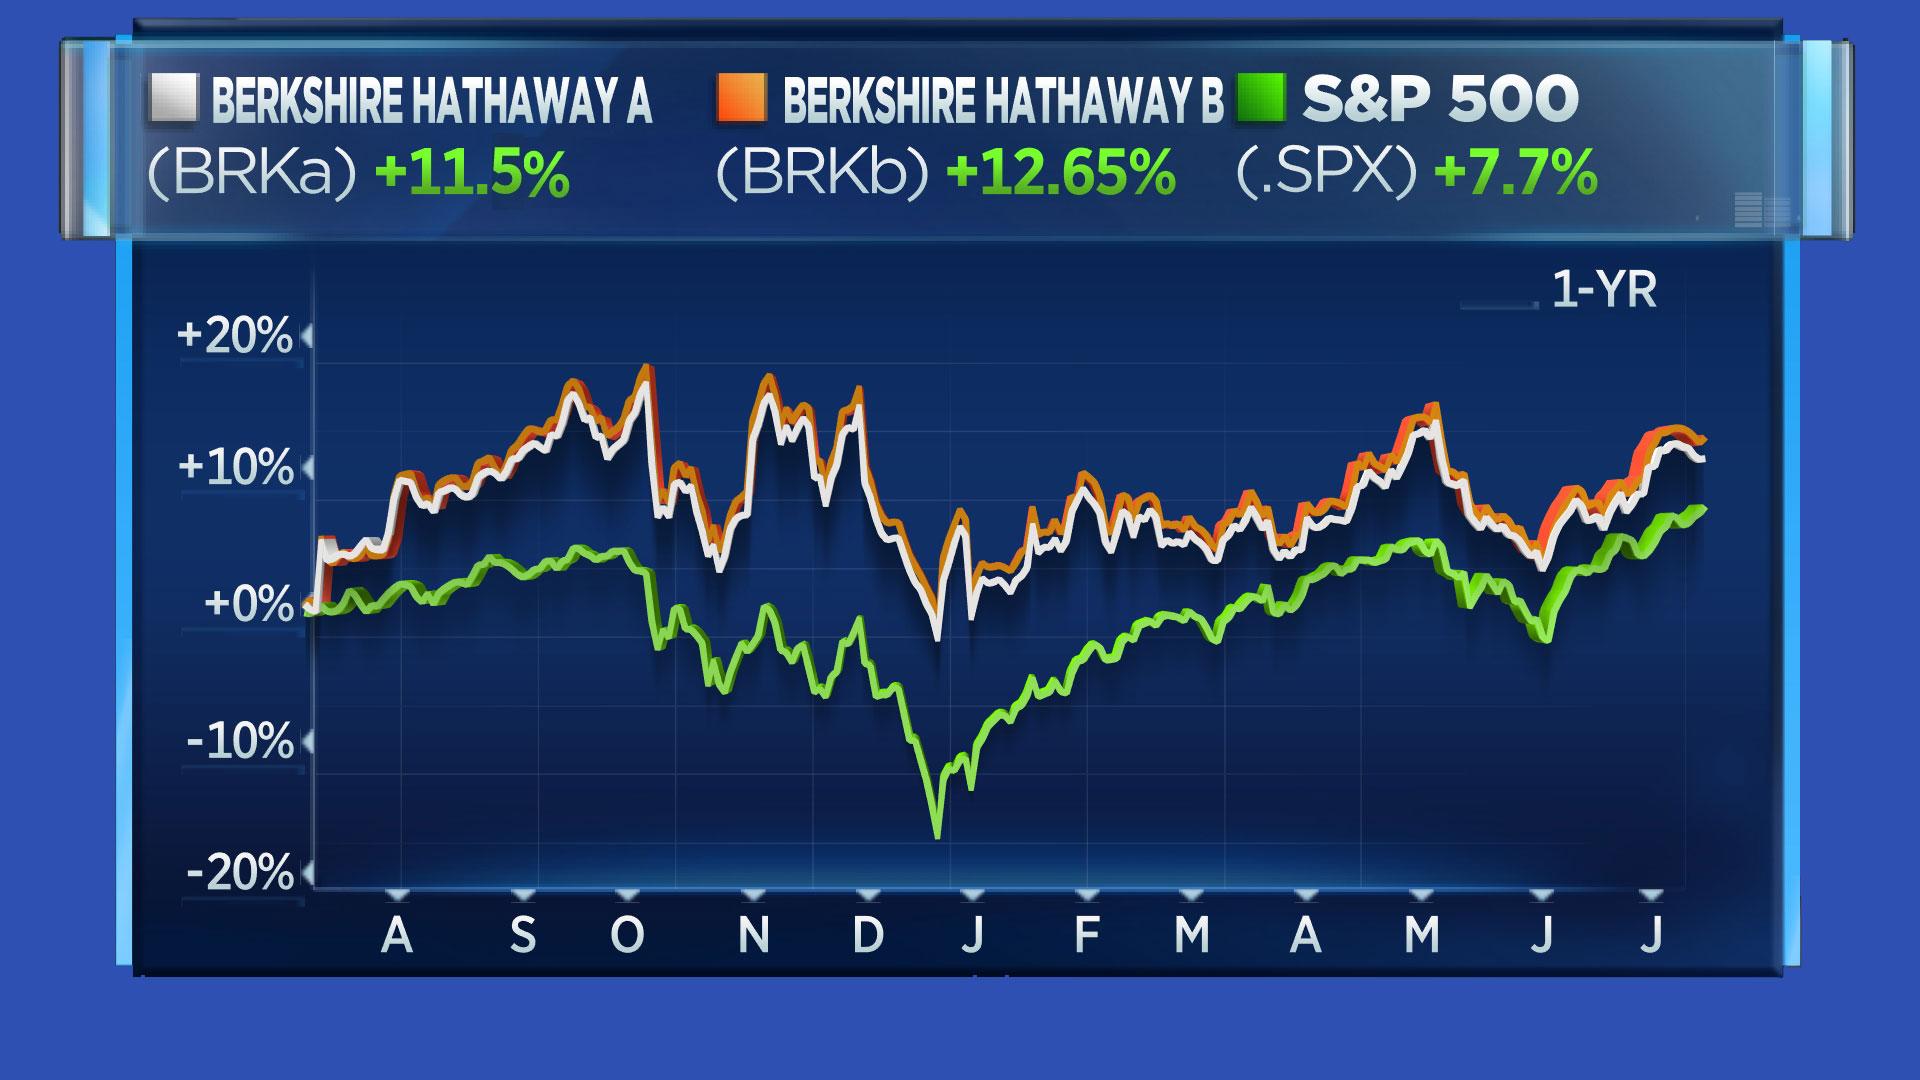 BRKA/BRKB/SPX one-year chart